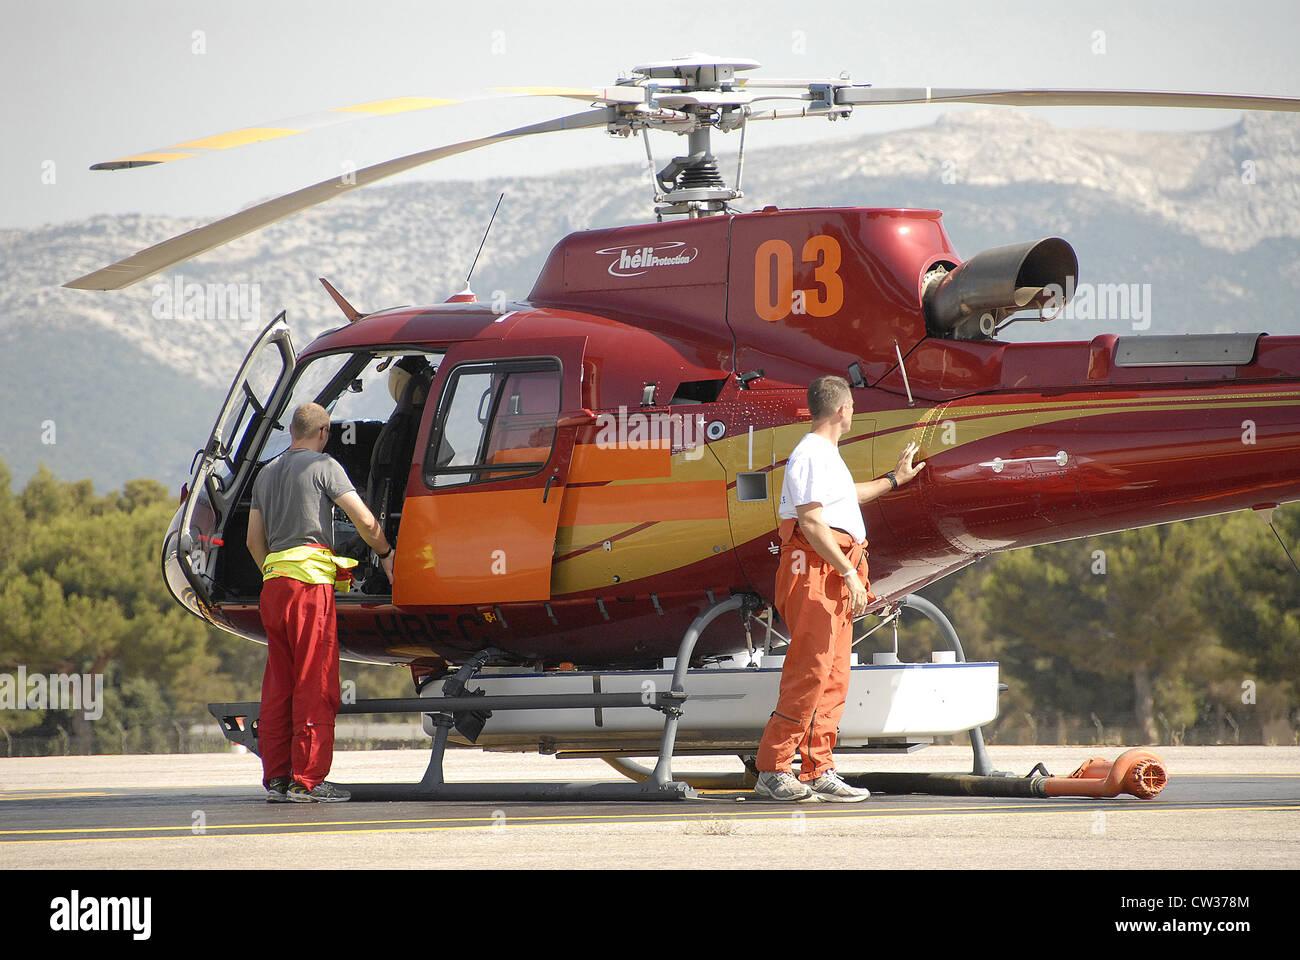 Helicóptero de rescate en Paul Ricard speedway Bouches du Rhone Provence Cote d'Azur, Francia Europa Imagen De Stock